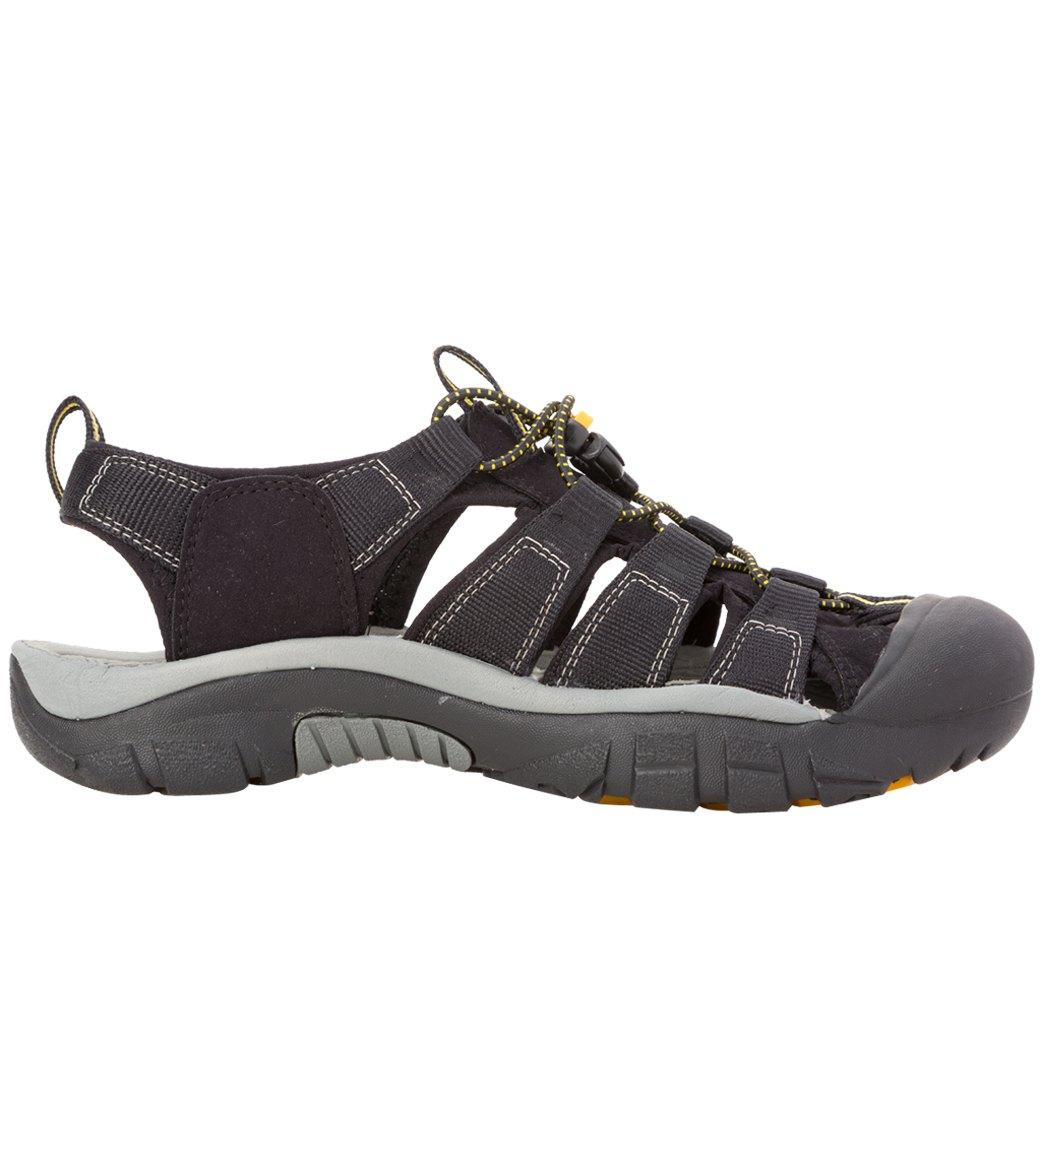 d7e354ed0d88 Keen Men s Newport H2 Water Shoes at SwimOutlet.com - Free Shipping